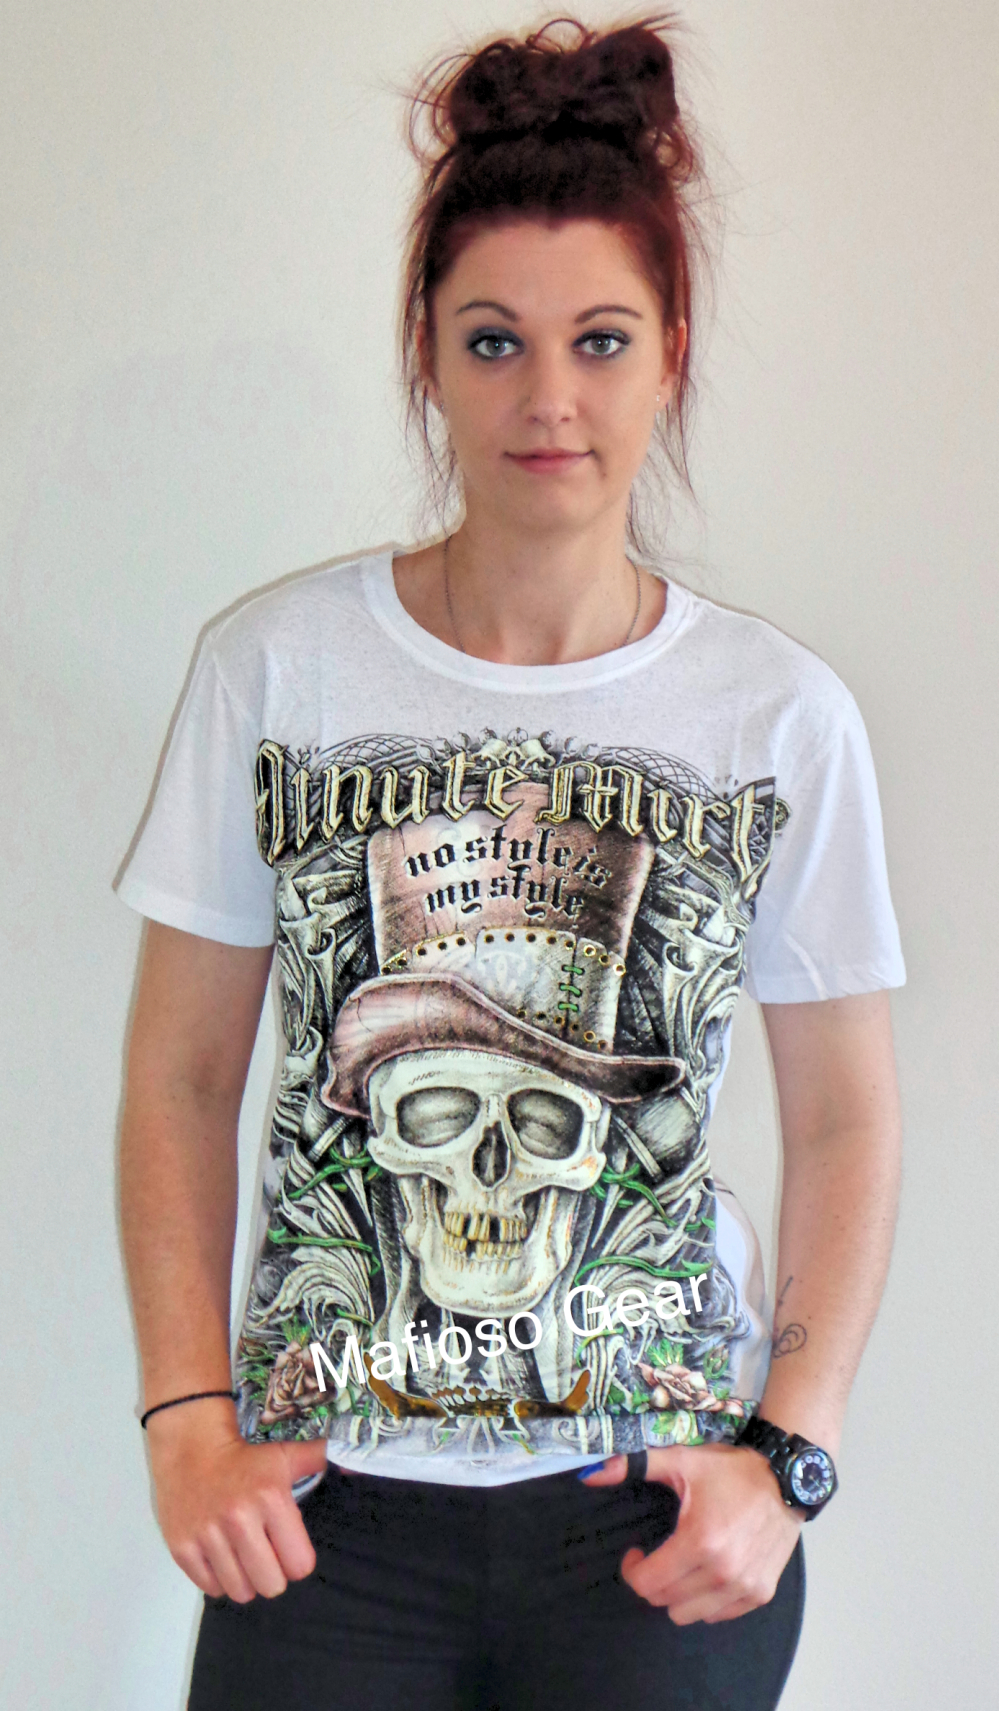 top_hat_t_shirt_unisex__t_shirts_5.jpg